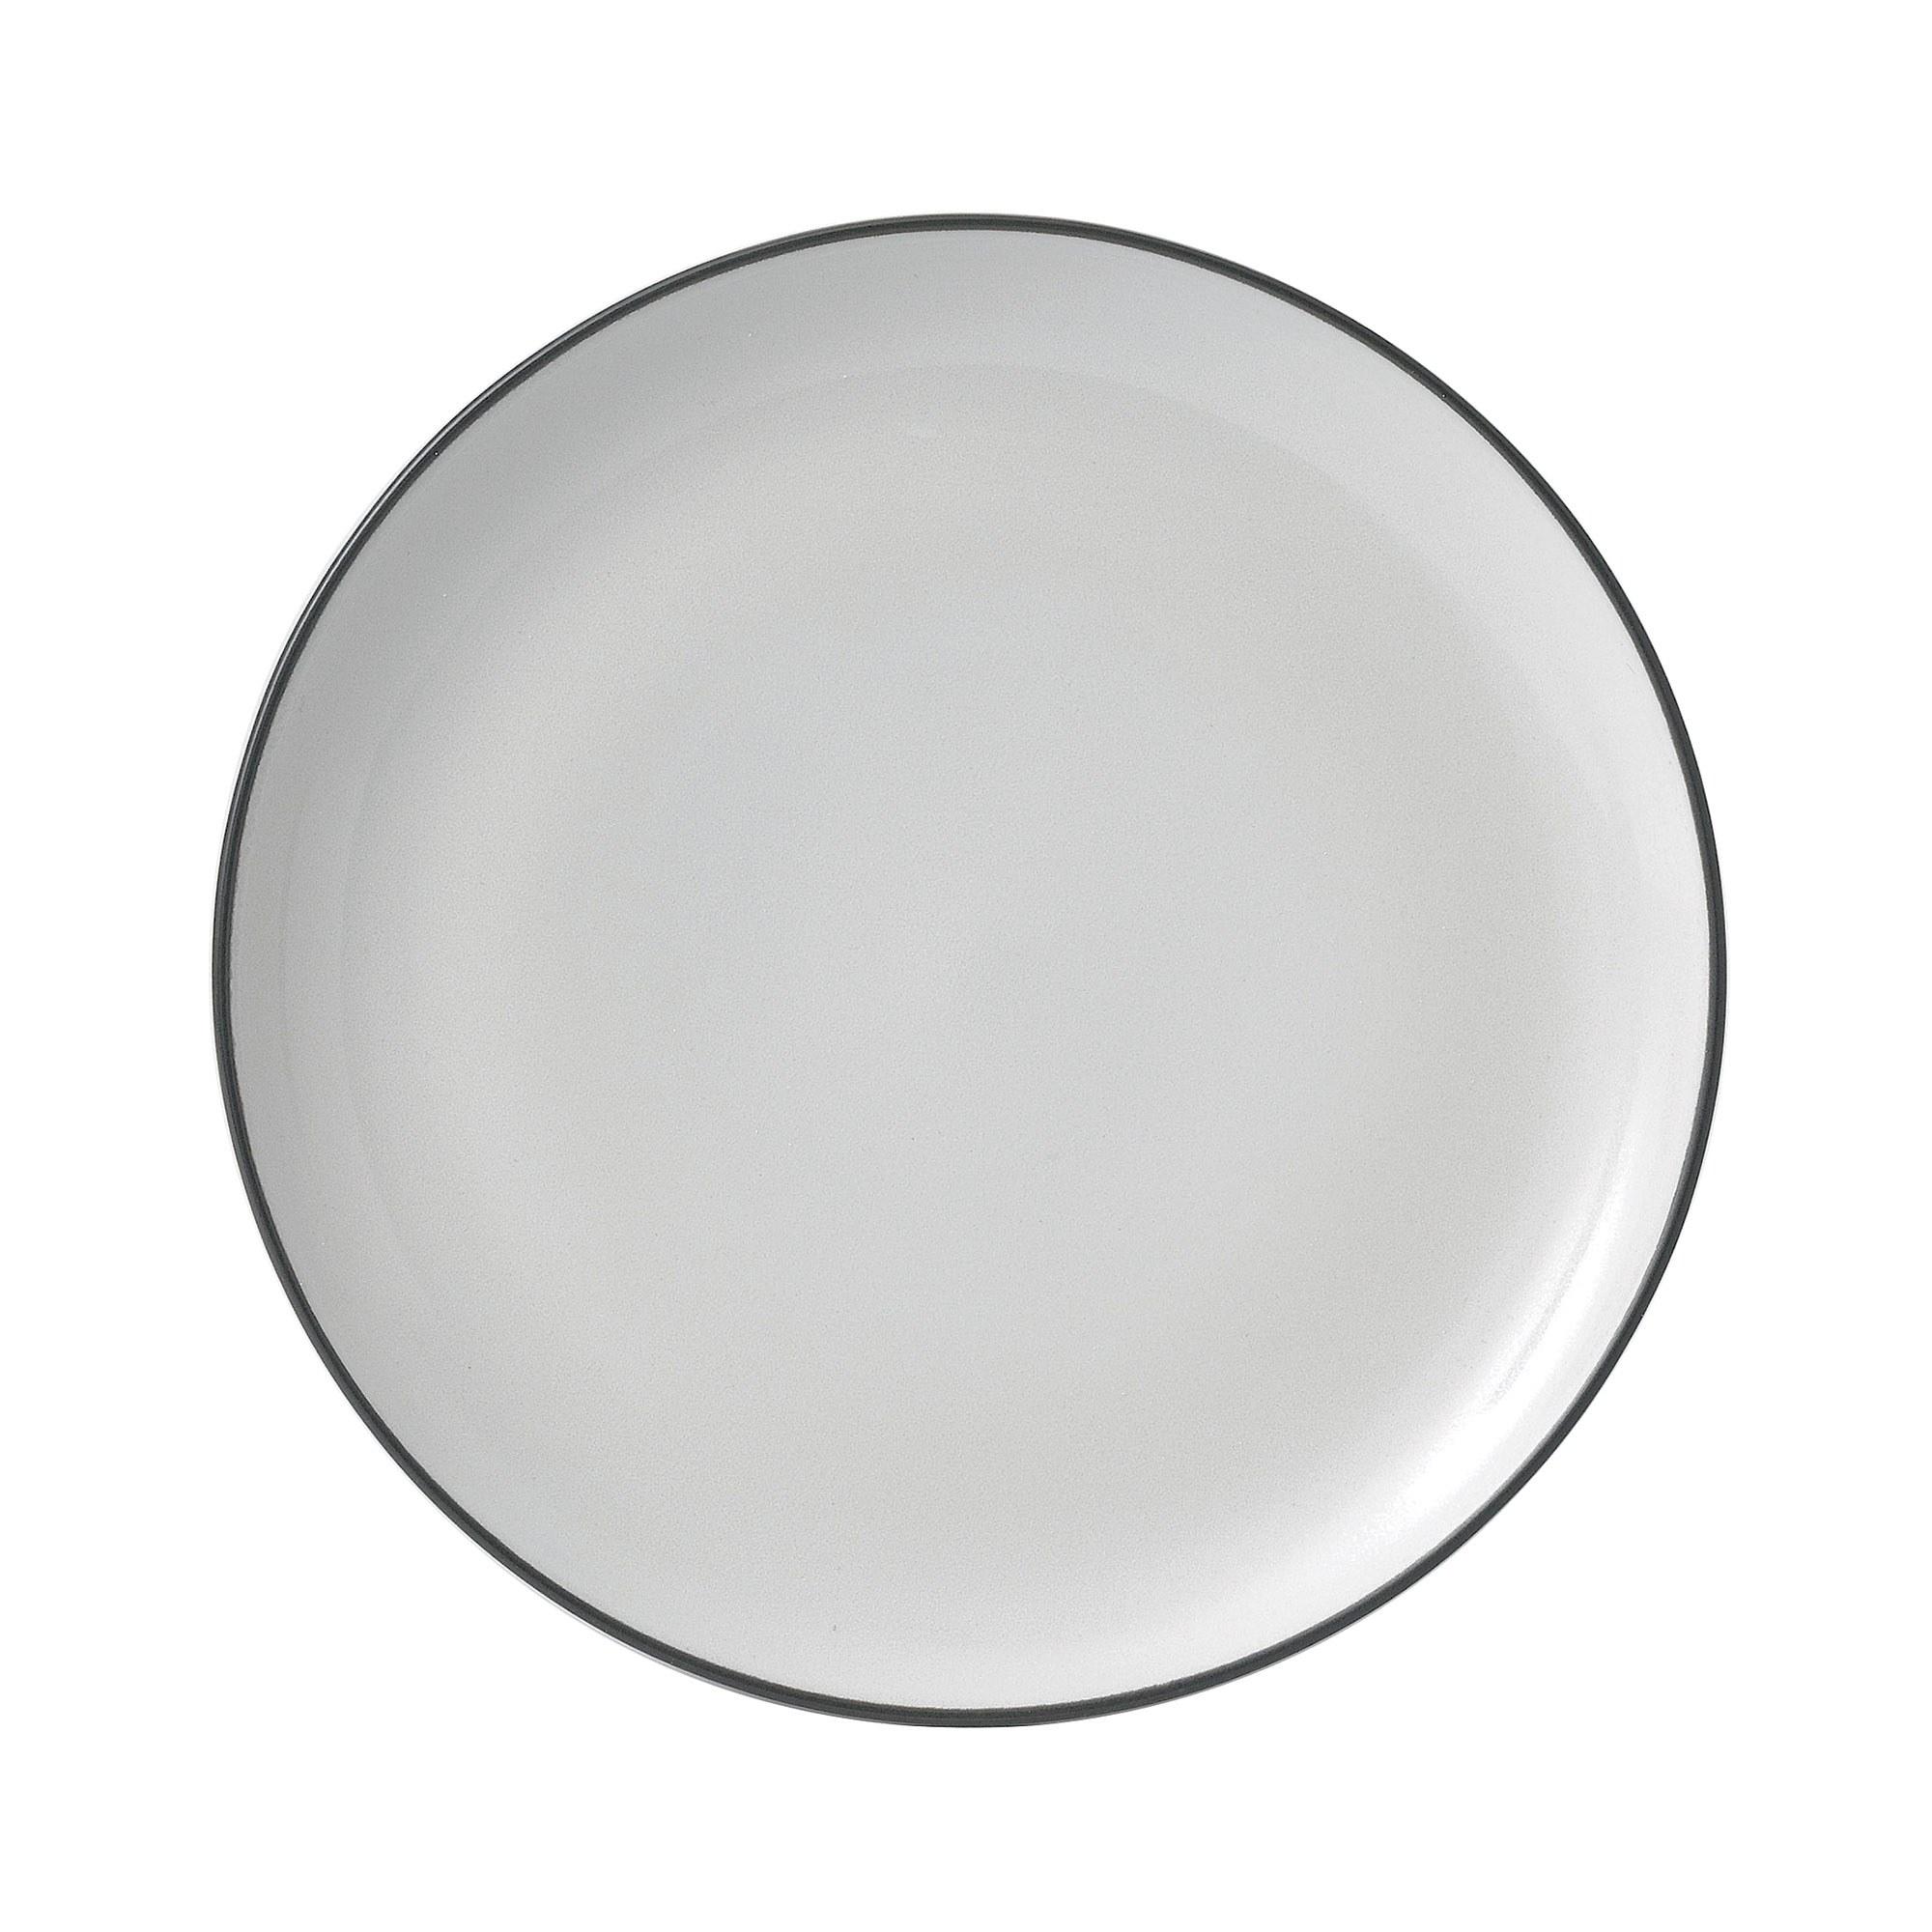 Gordon Ramsay Bread Street White Plate 21cm